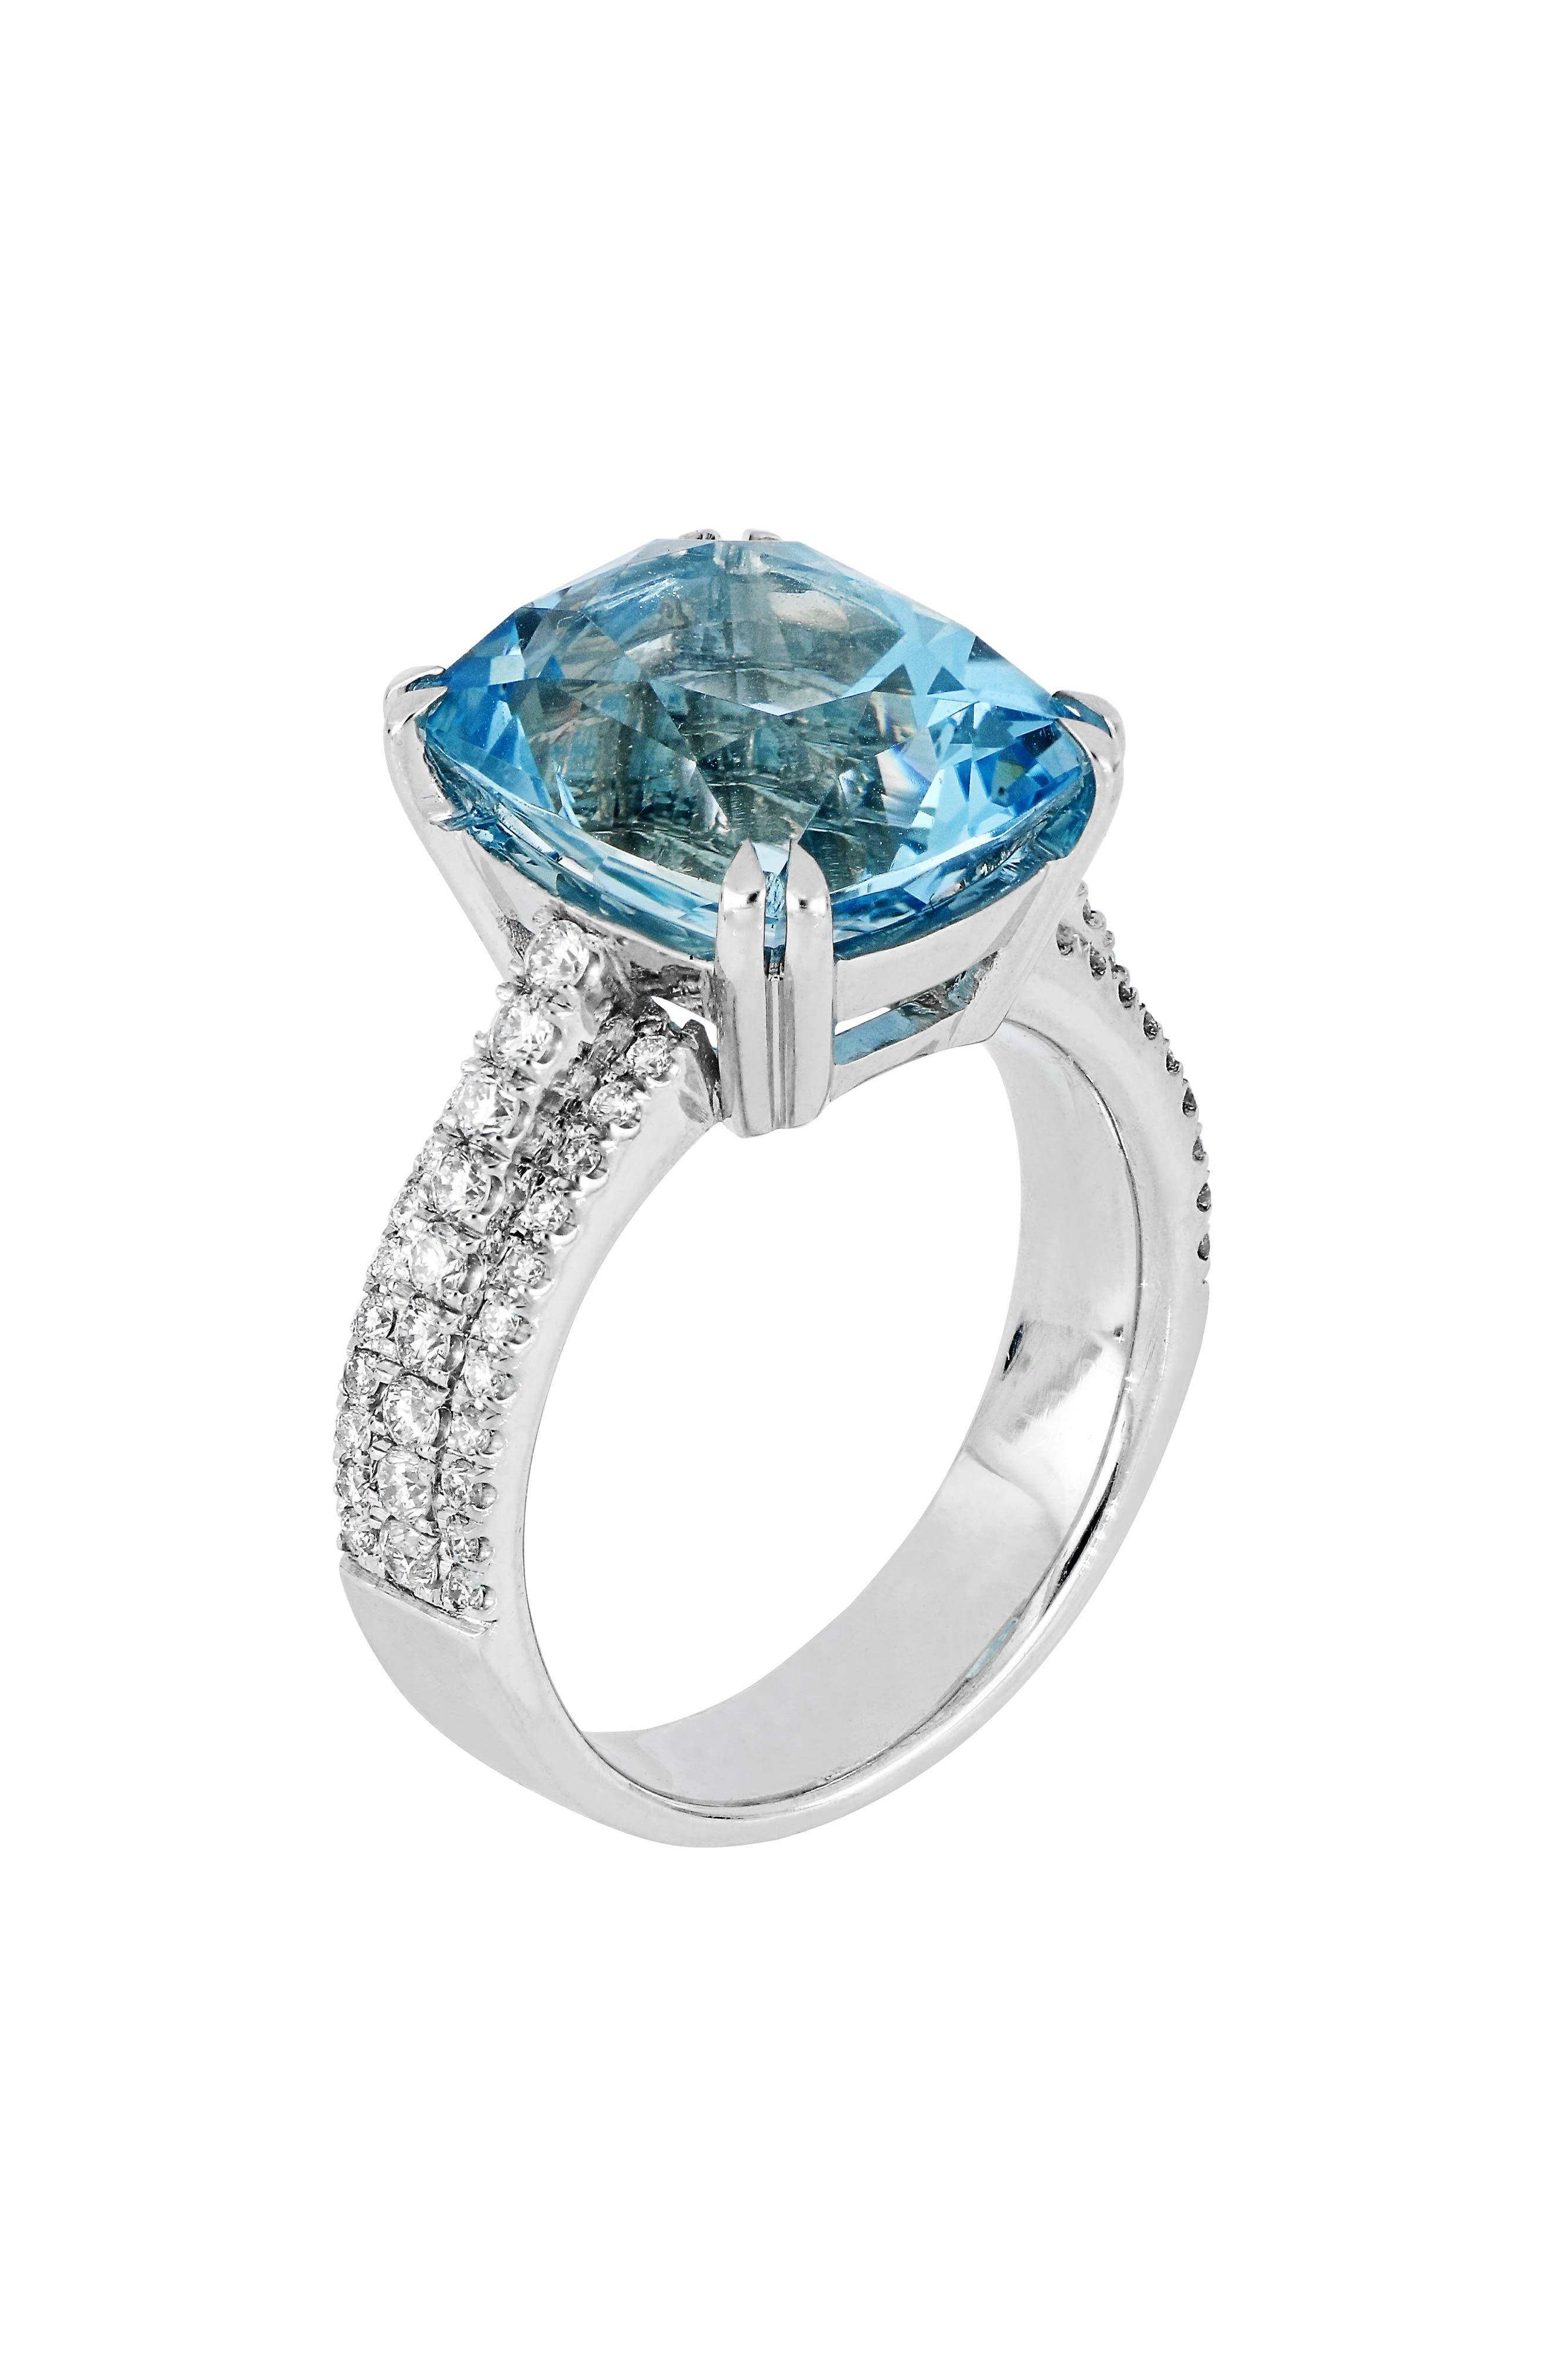 Aquamarine & Diamond Ring,                         Main,                         color, WHITE GOLD